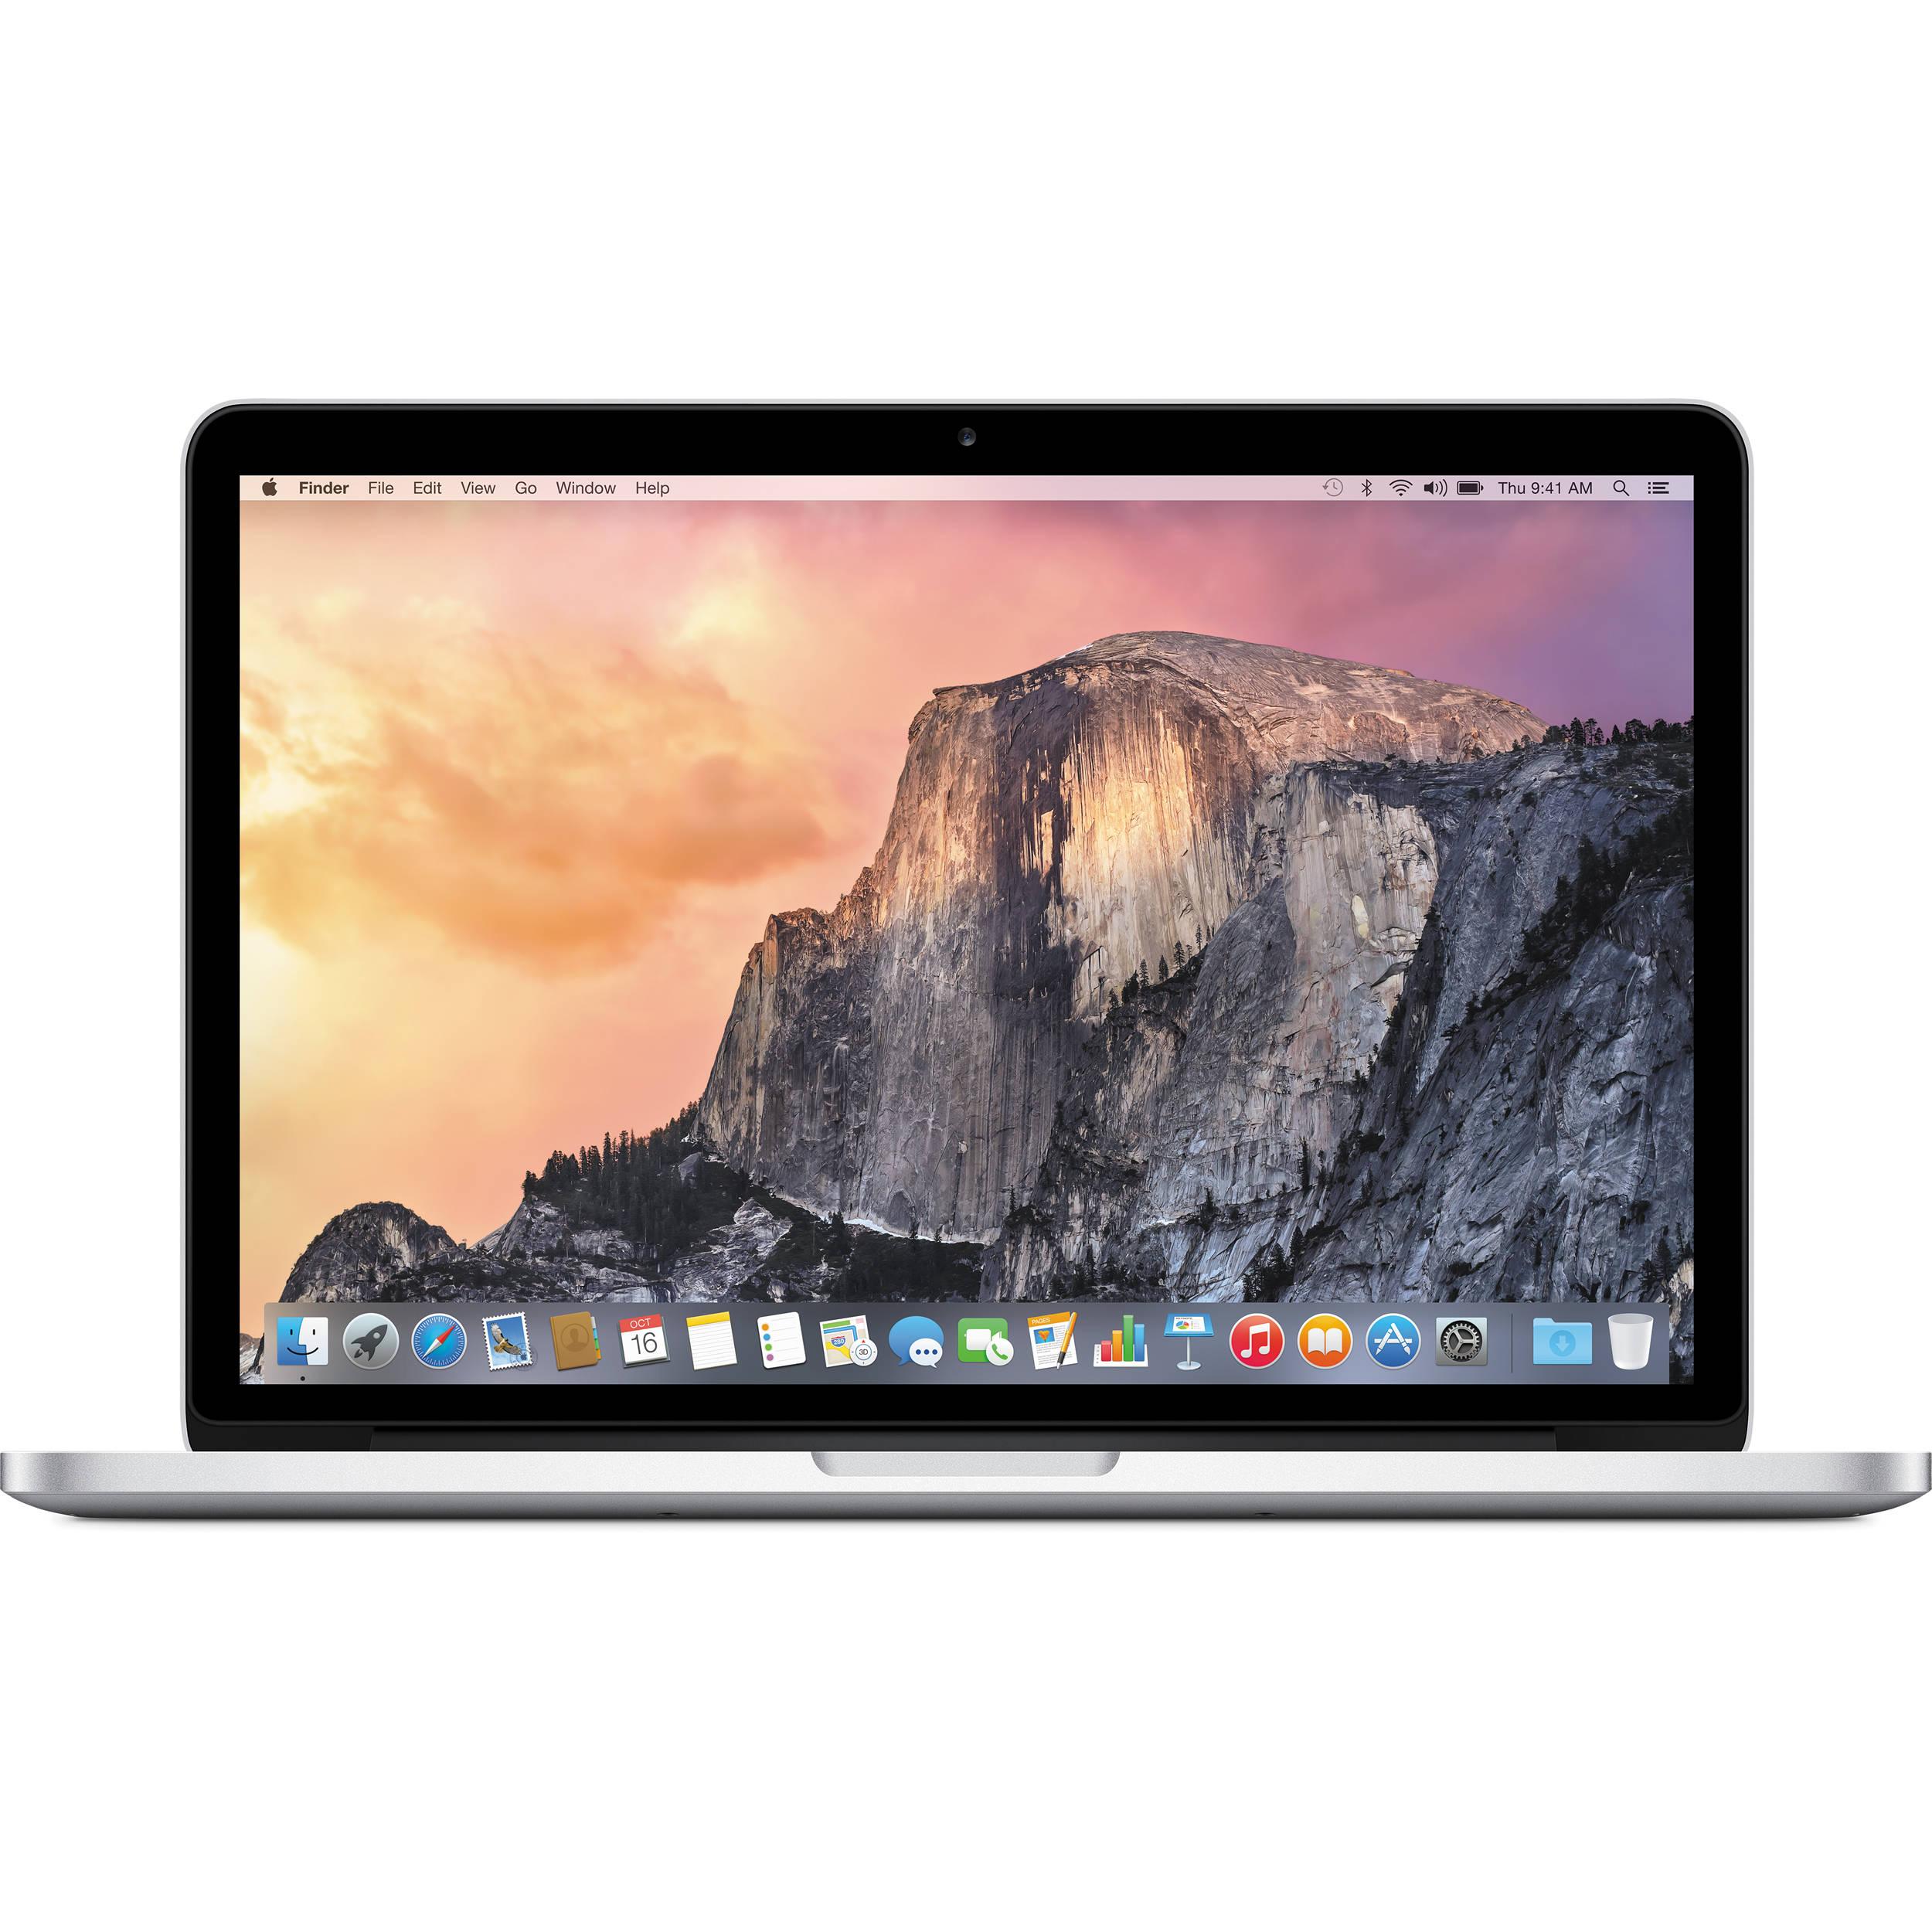 apple 13 3 macbook pro laptop computer z0qn mf8401 b h b h. Black Bedroom Furniture Sets. Home Design Ideas